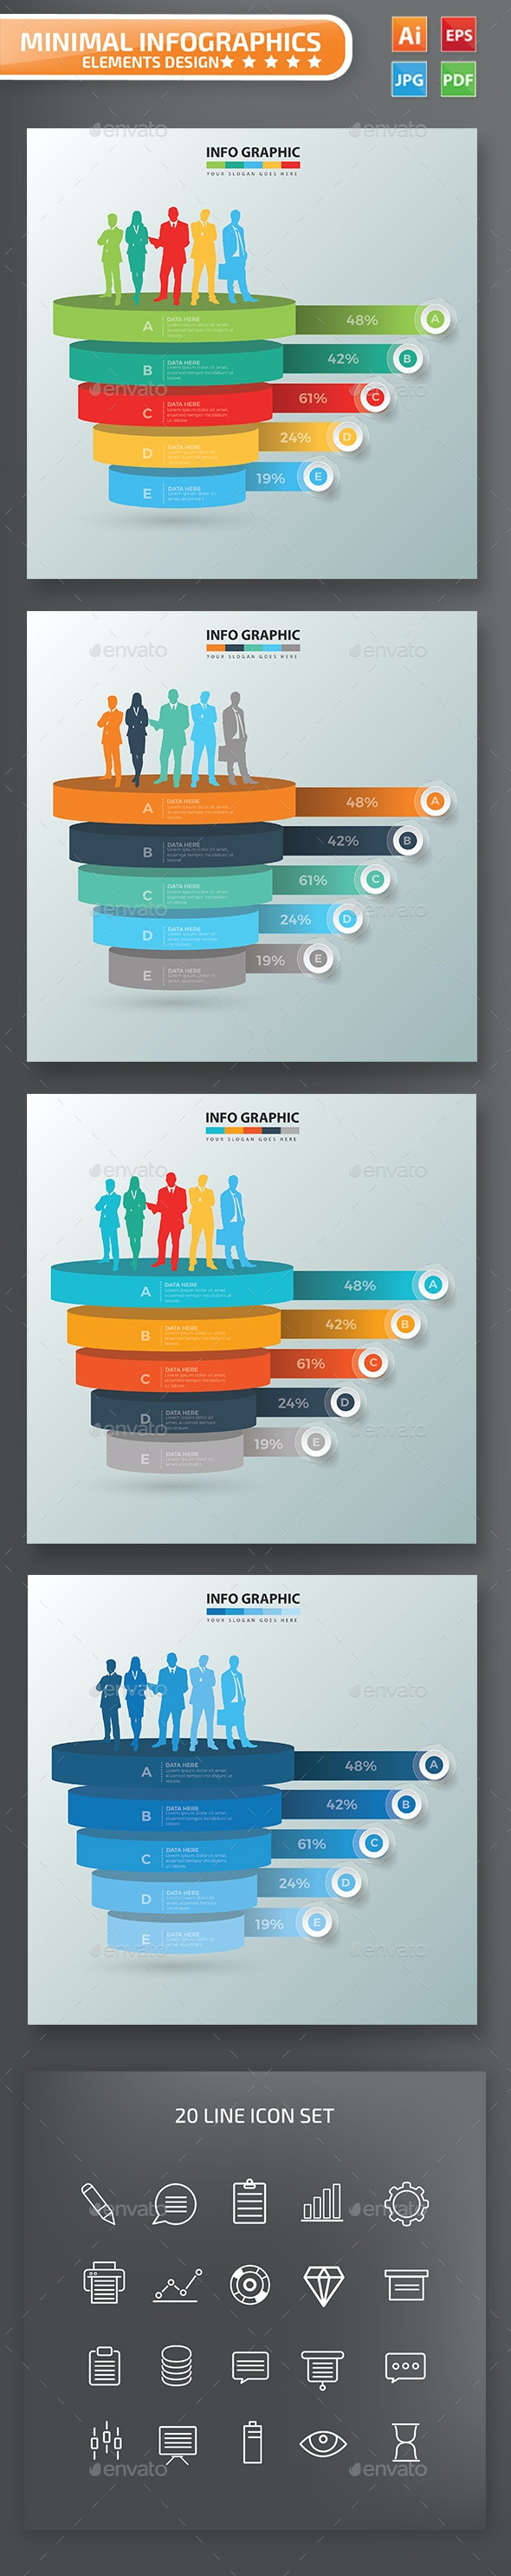 Human Resource Infographic Design - Infographics